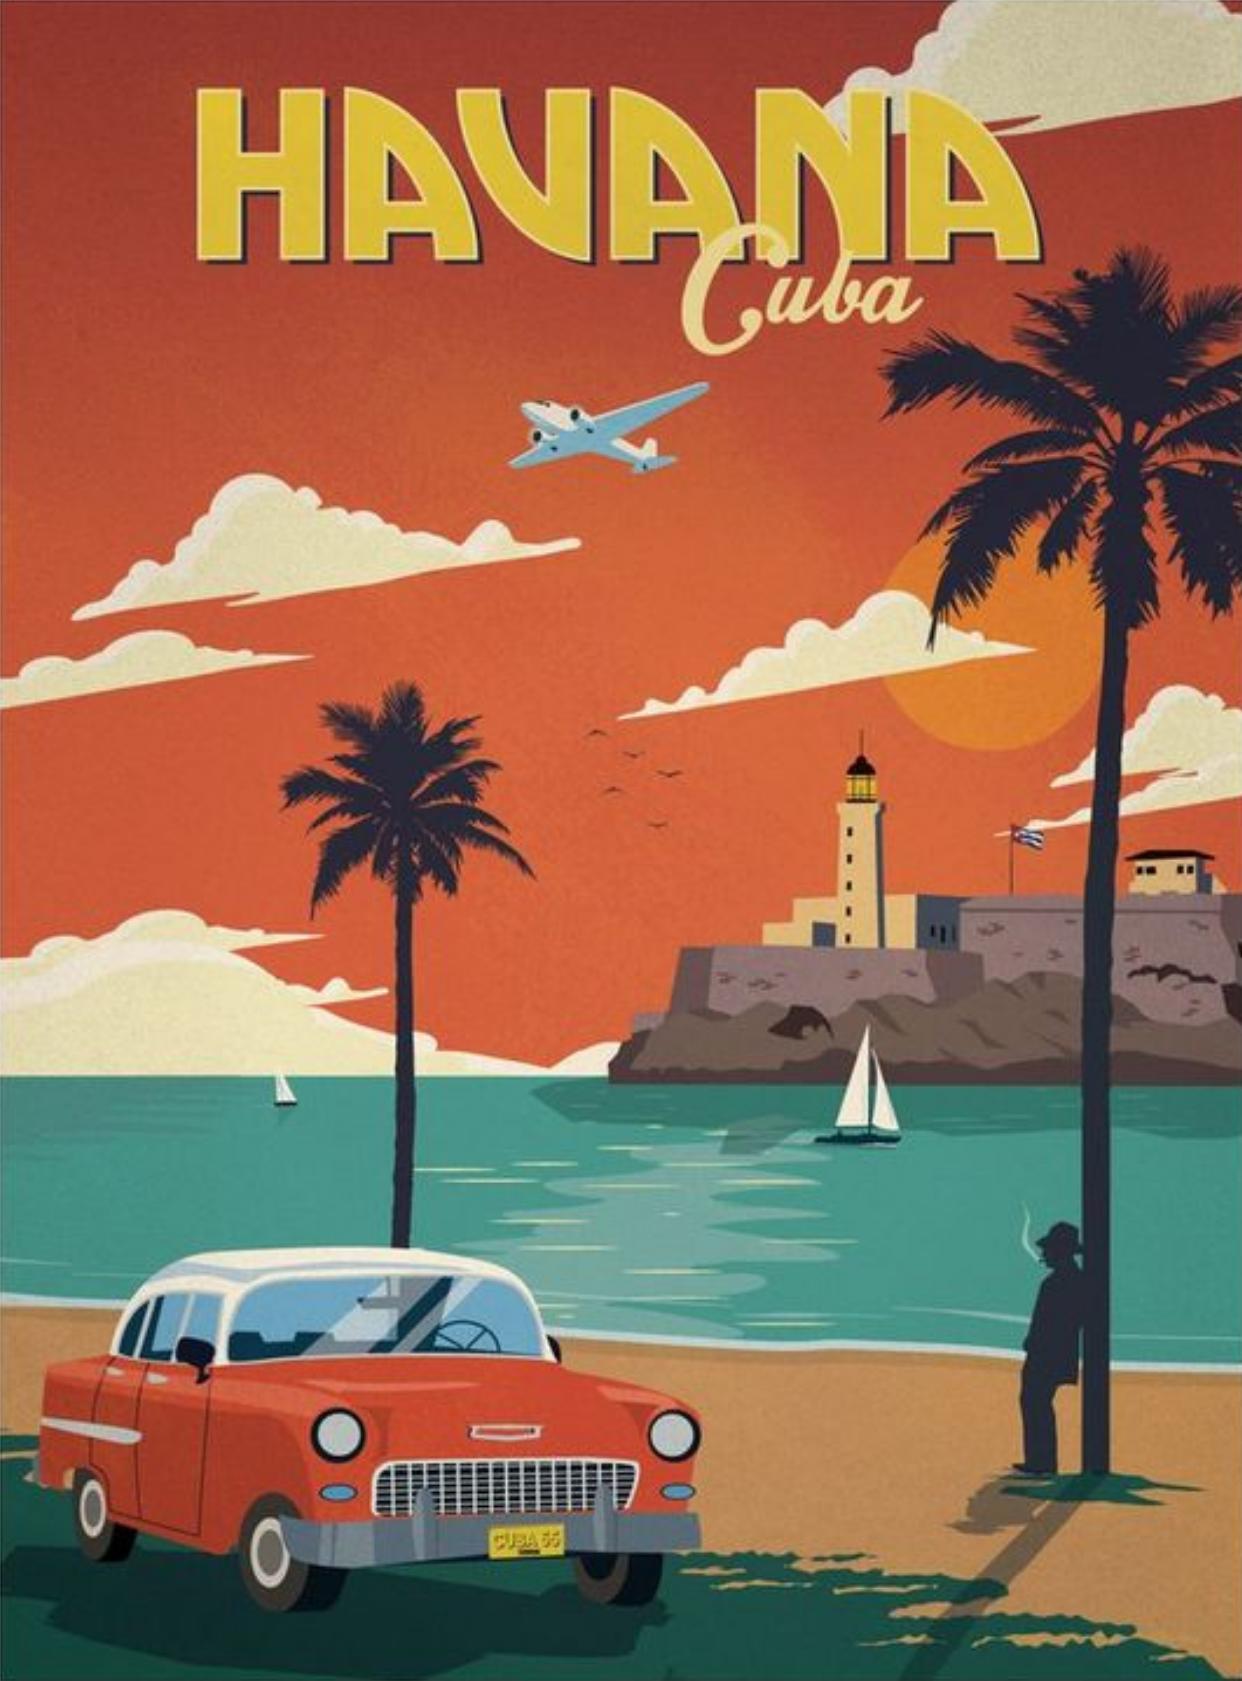 Havana Cuba Retro Travel Poster Retro Poster Vintage Travel Posters